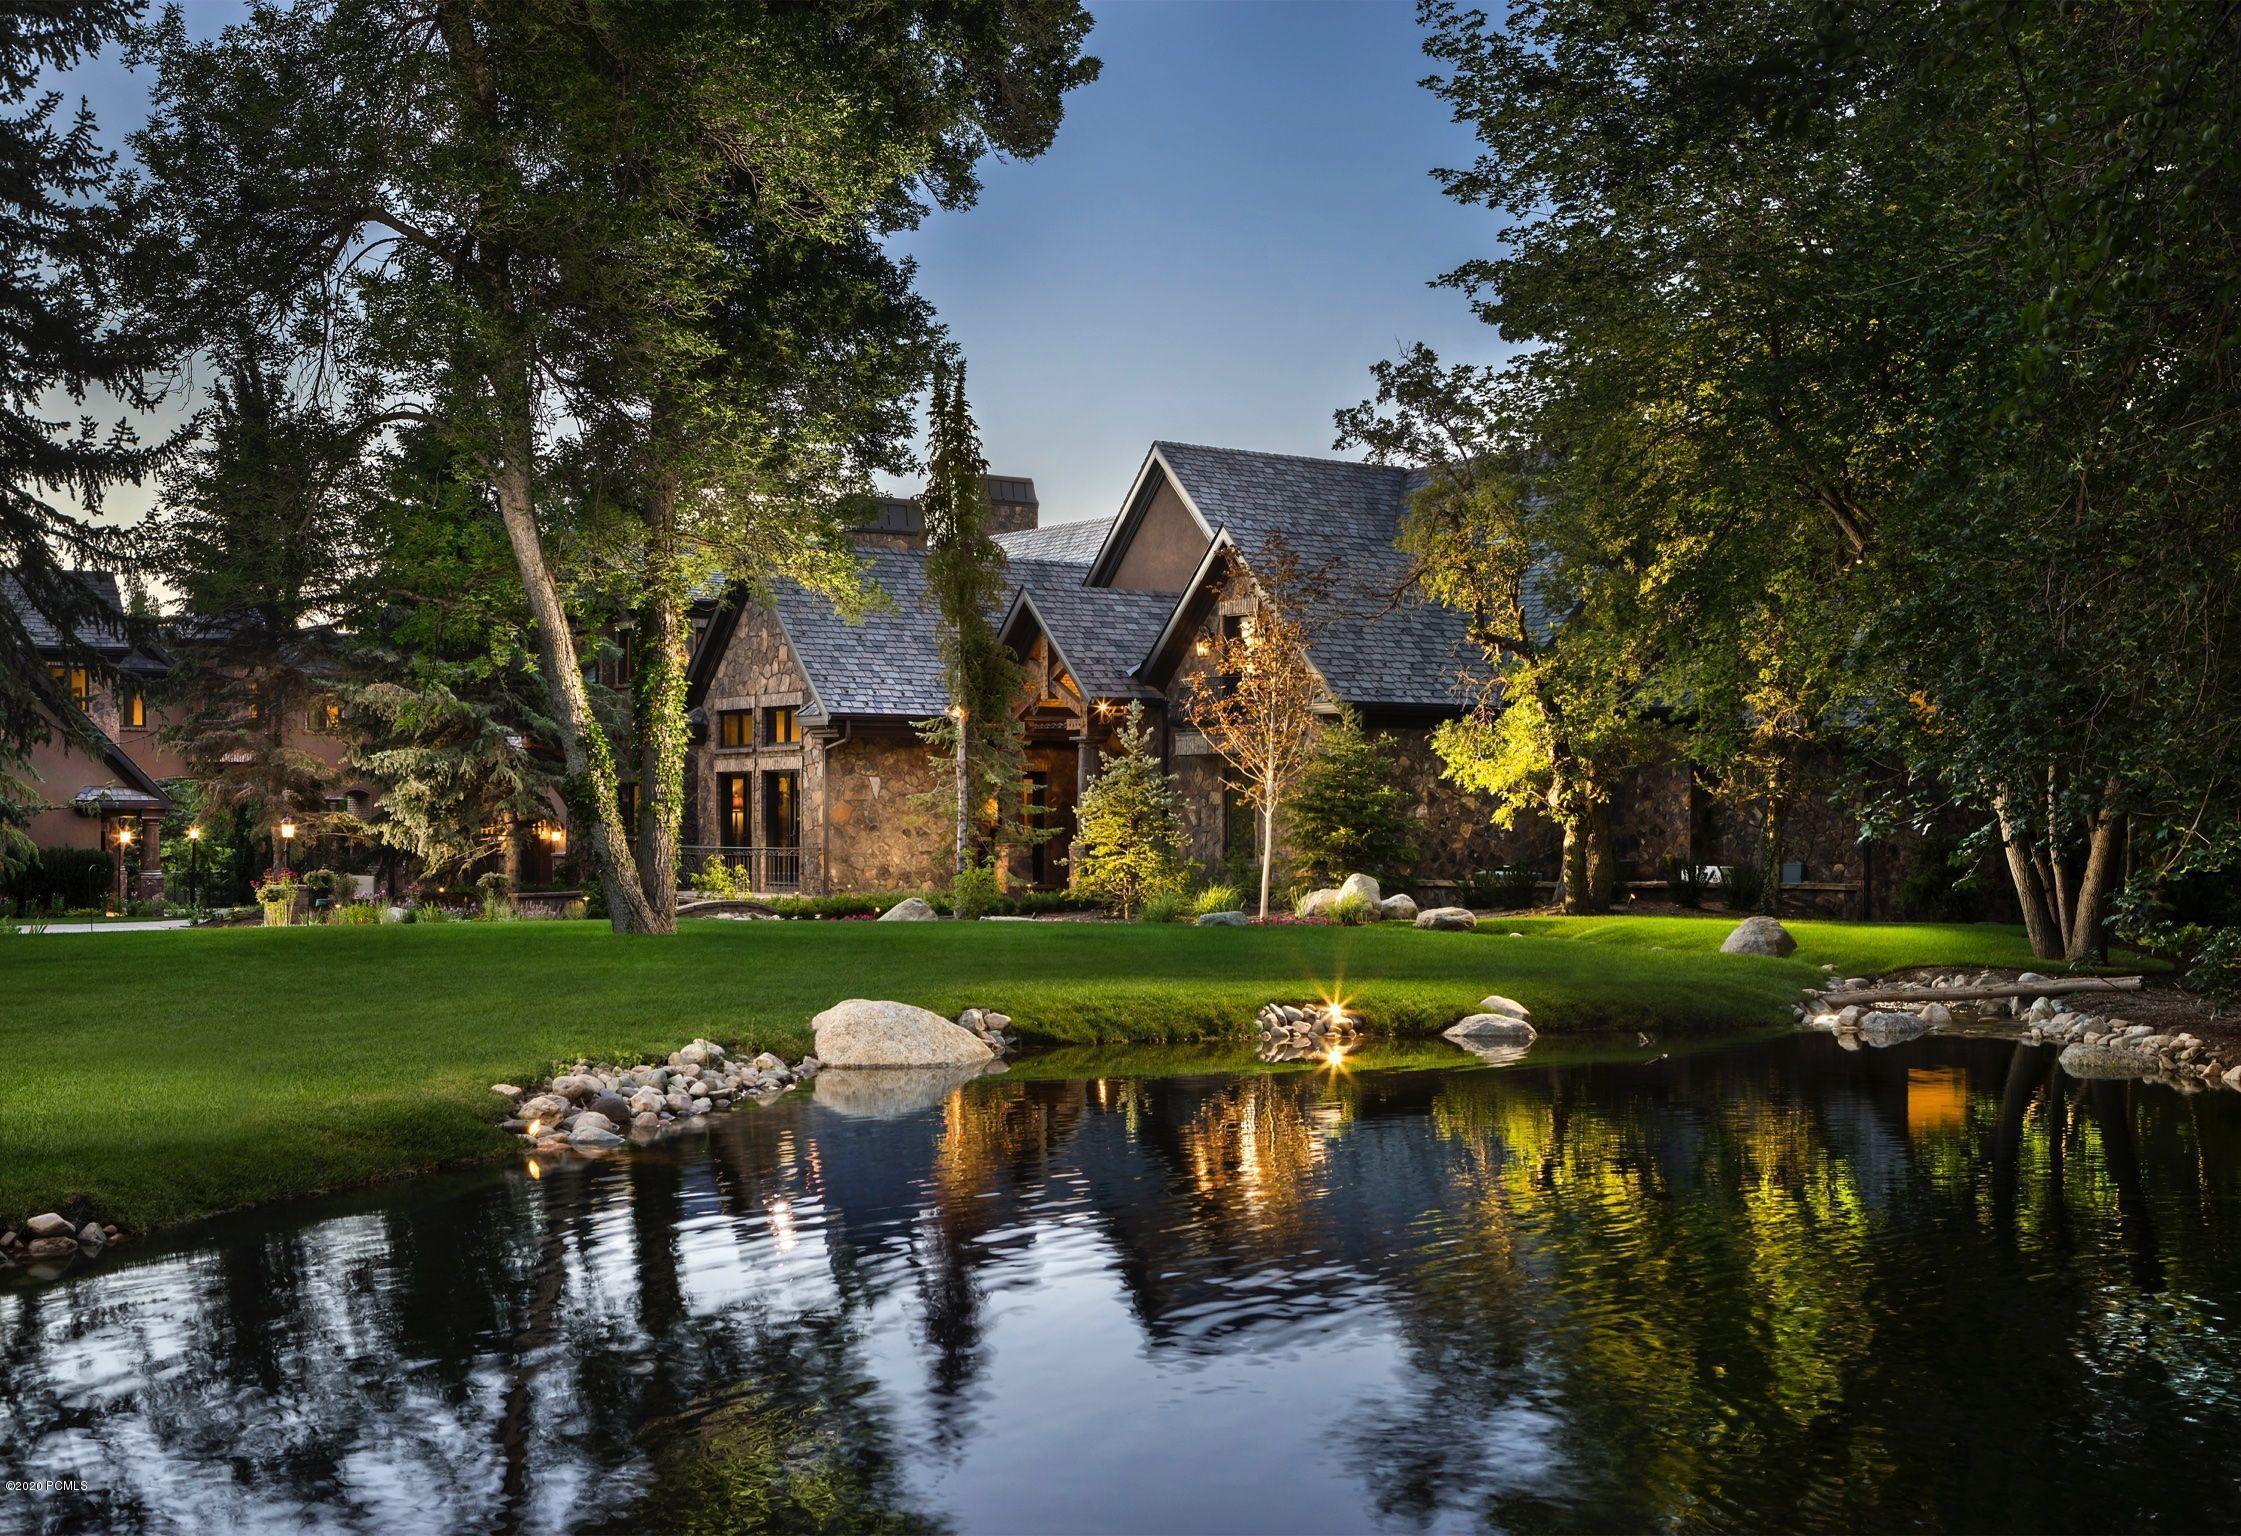 2388 Oakhill Drive, Salt Lake City, Utah 84121, 7 Bedrooms Bedrooms, ,9 BathroomsBathrooms,Single Family,For Sale,Oakhill,12004470